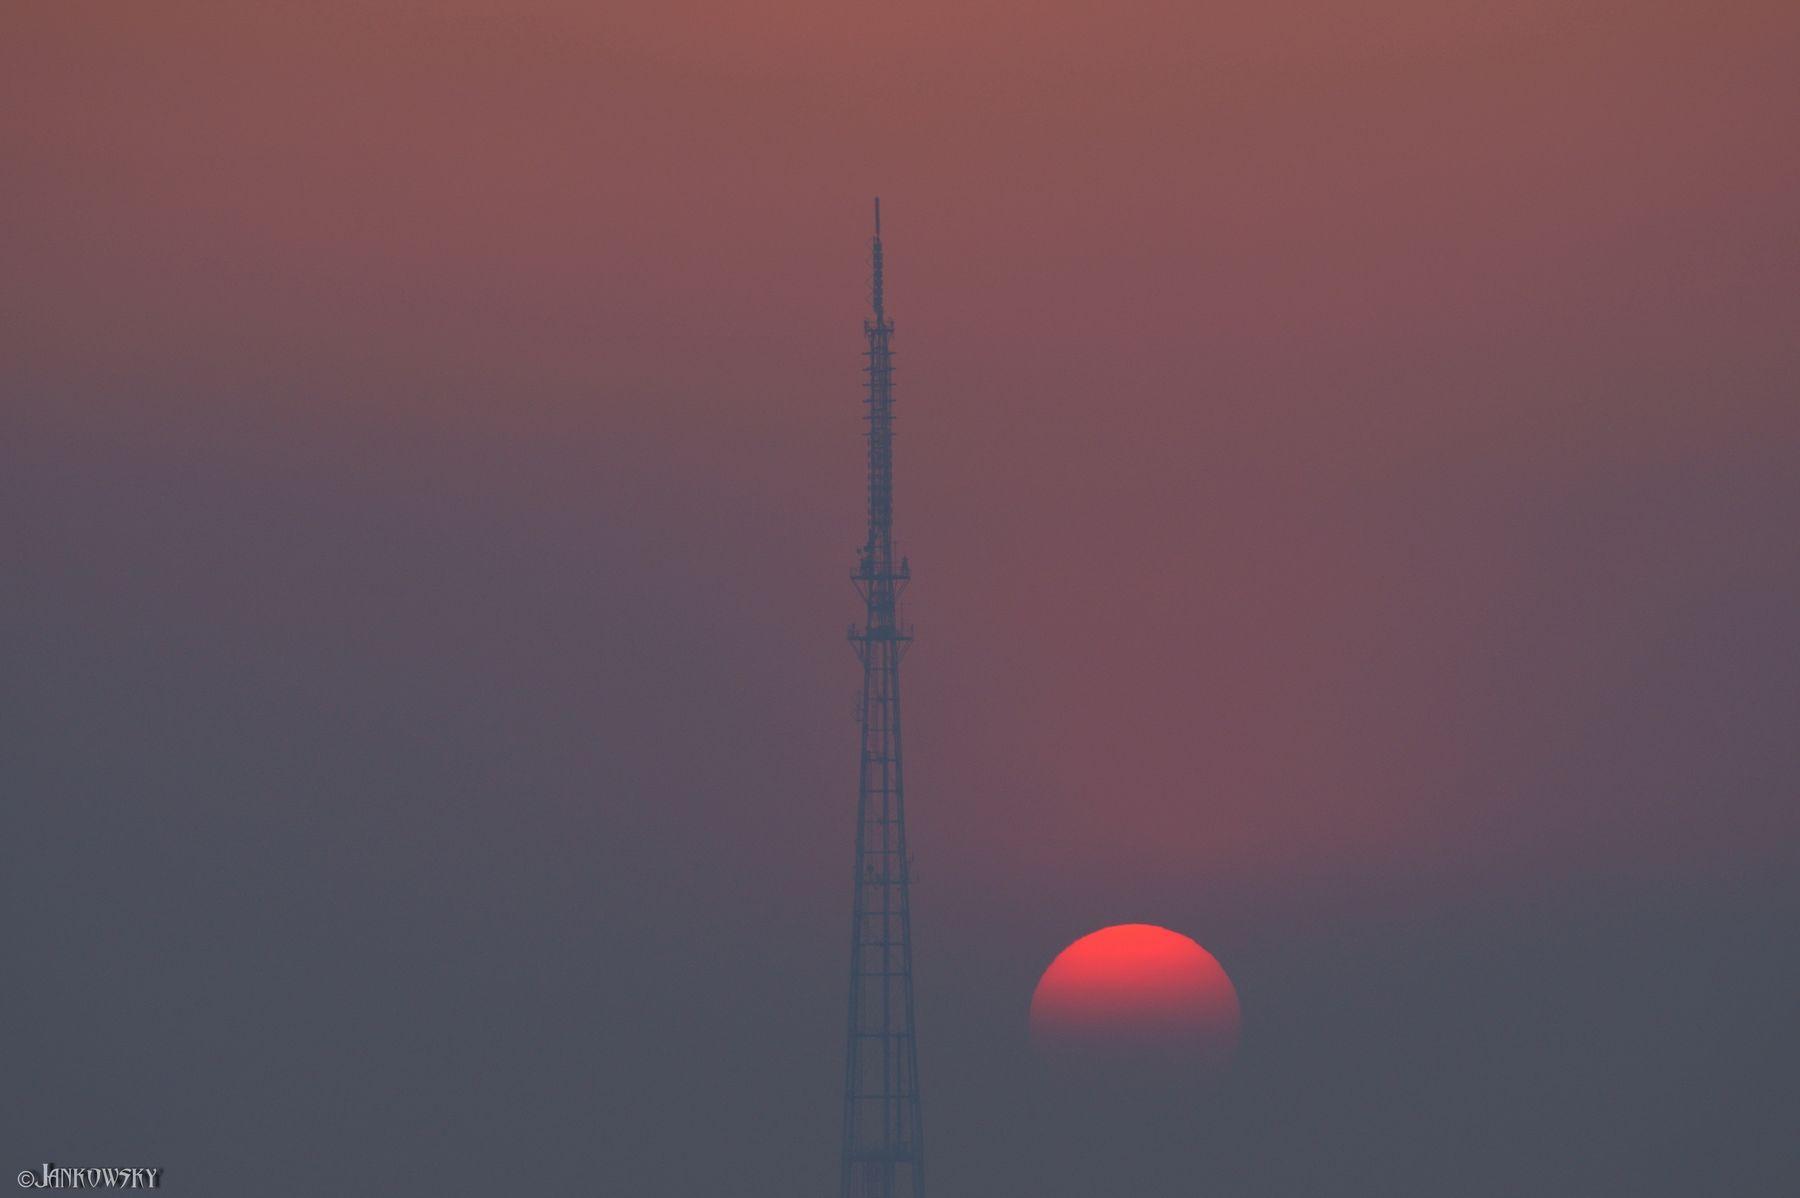 Пекло 6.05.21 -  Транзит  по телебашне омск смог солнце транзит телебашня диск солнца красное туман canon FD 300mm f2.8